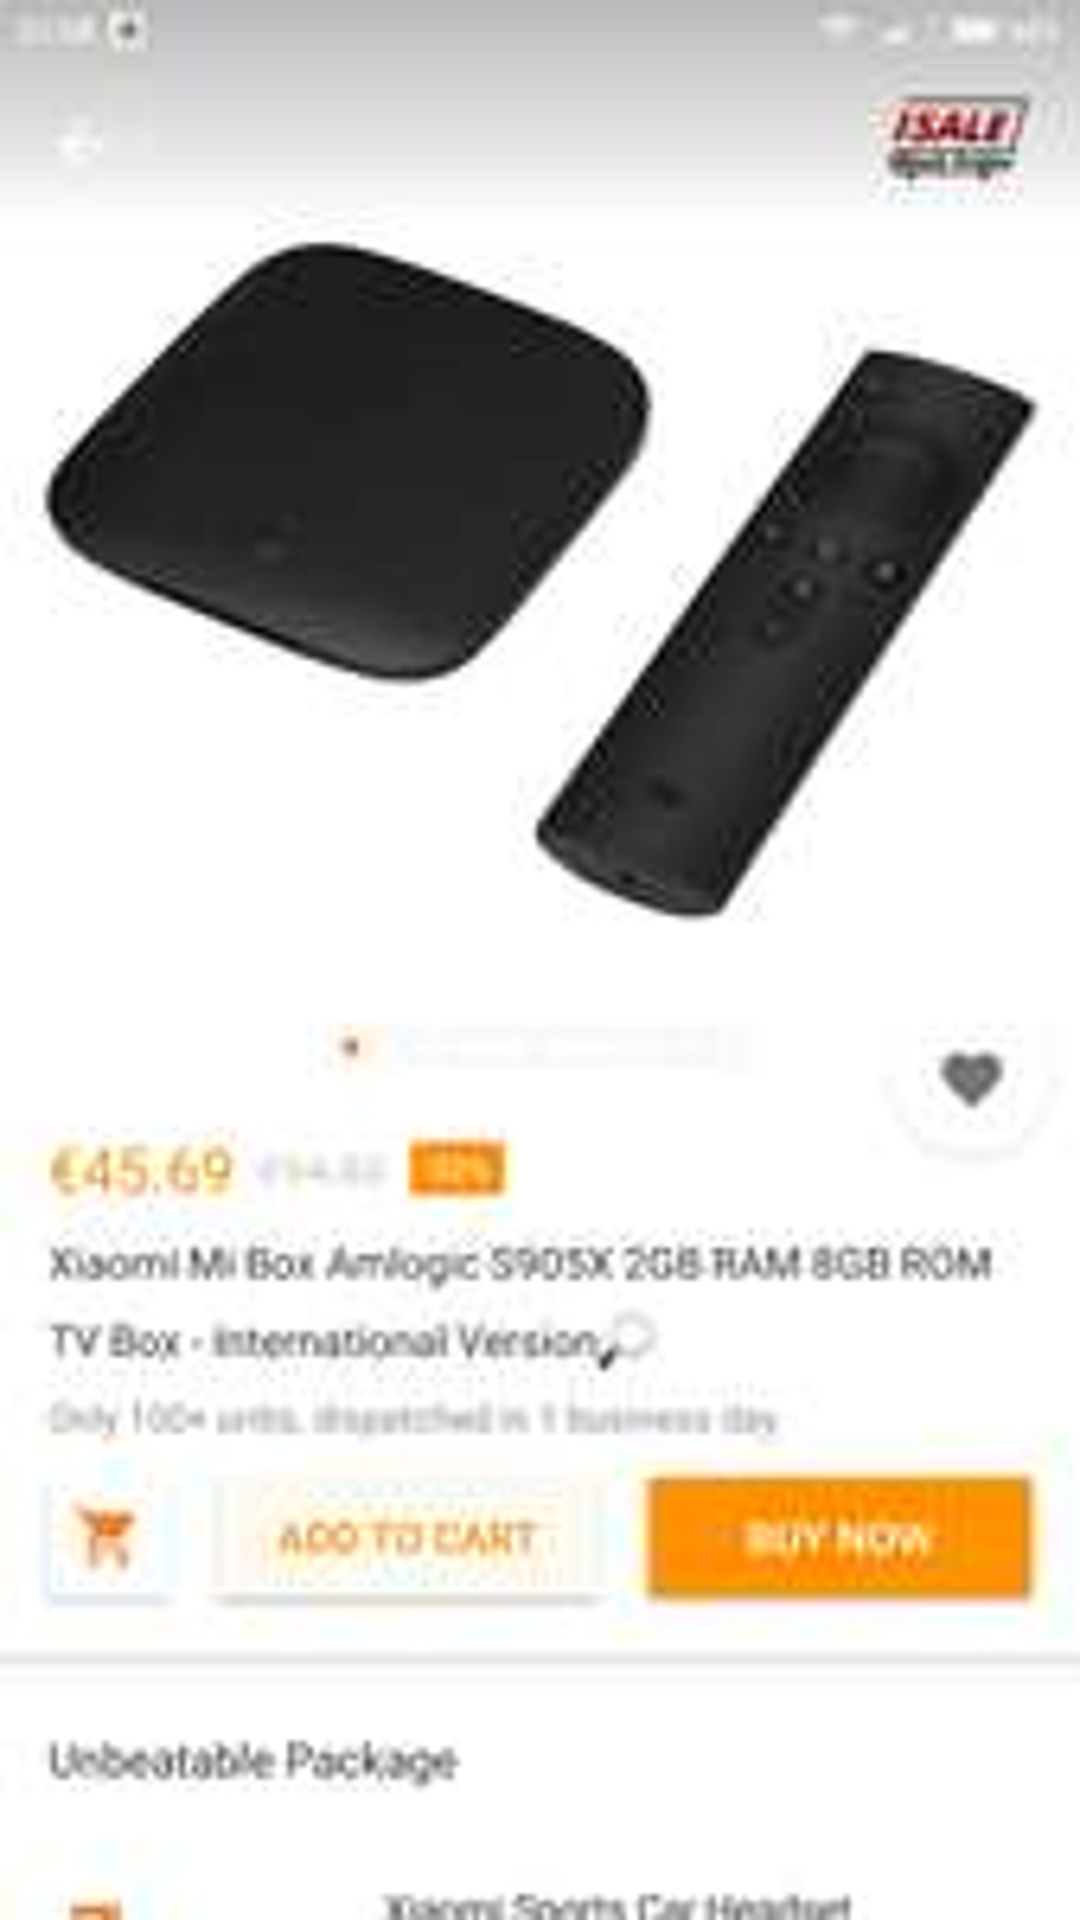 ORIGINAL Xiaomi Mi Box S905X